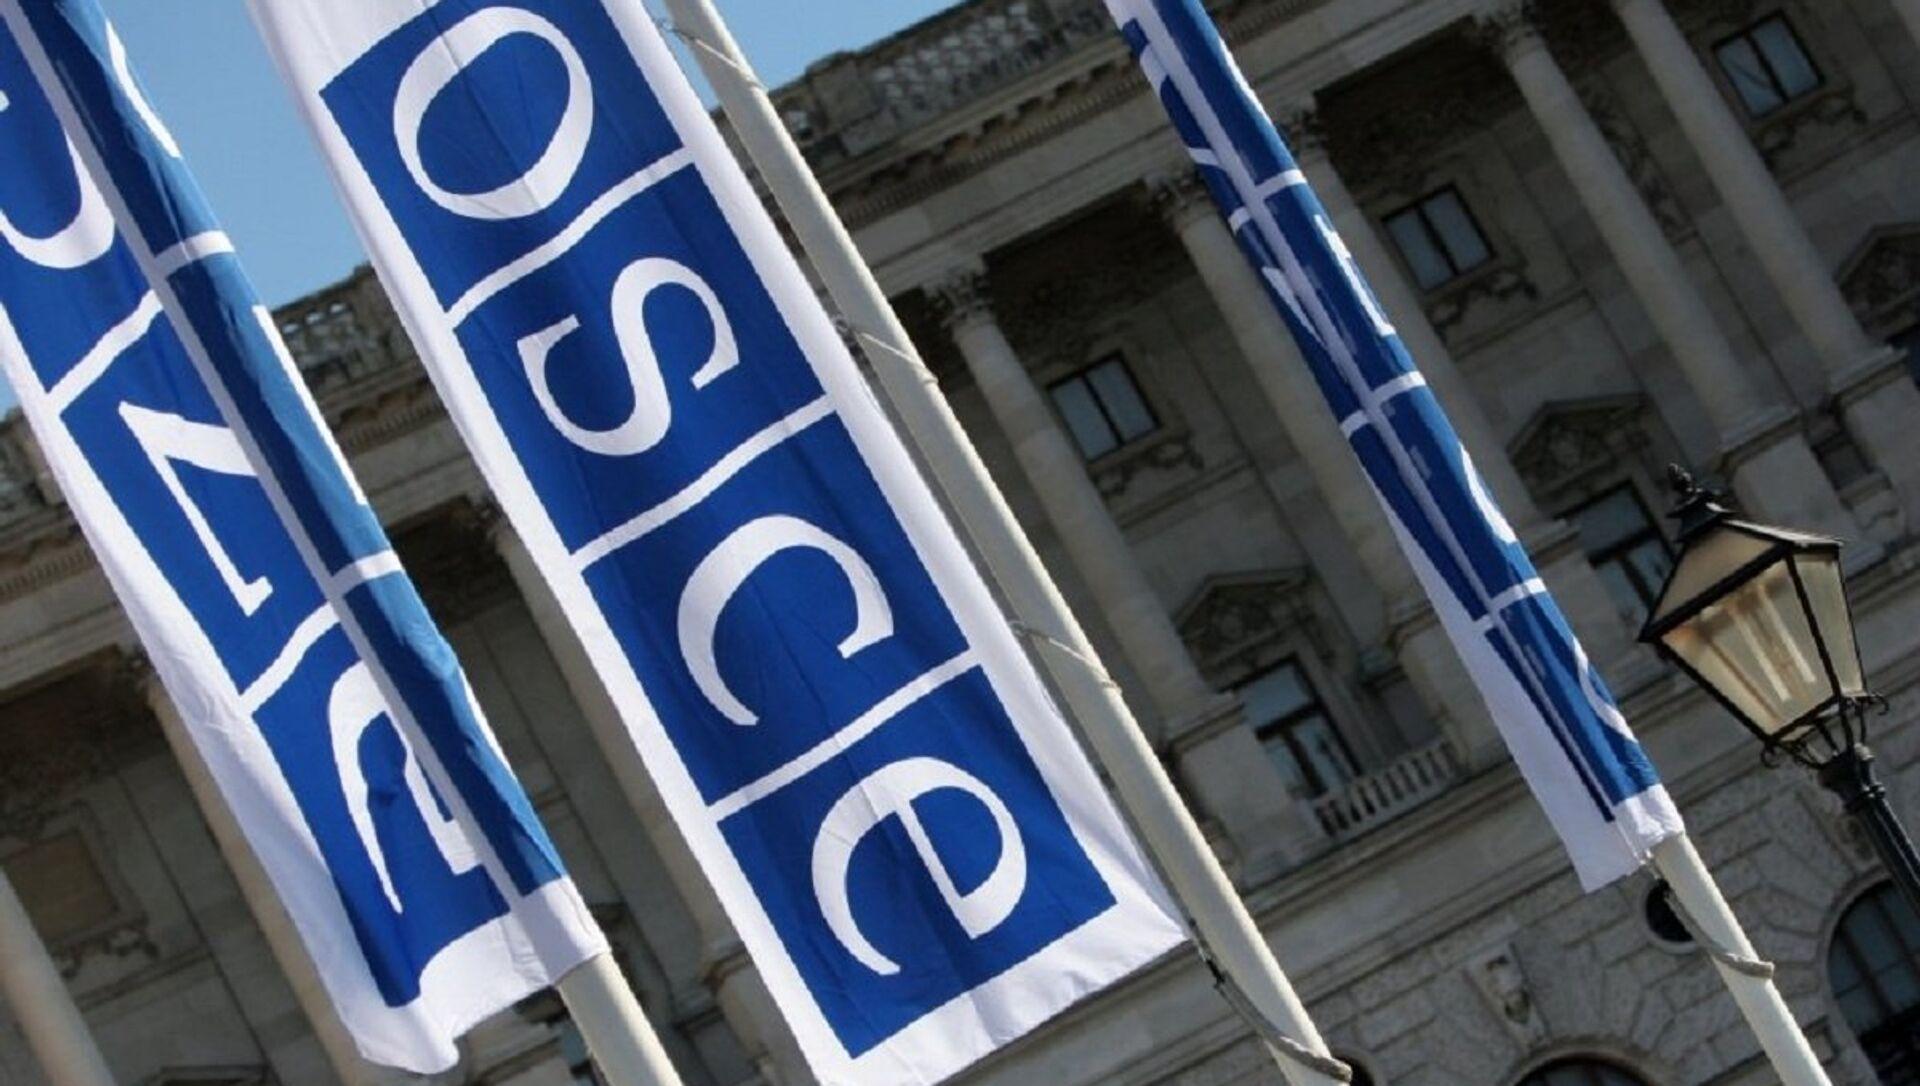 Flags with a logo of OSCE in Vienna - Sputnik Italia, 1920, 07.05.2021